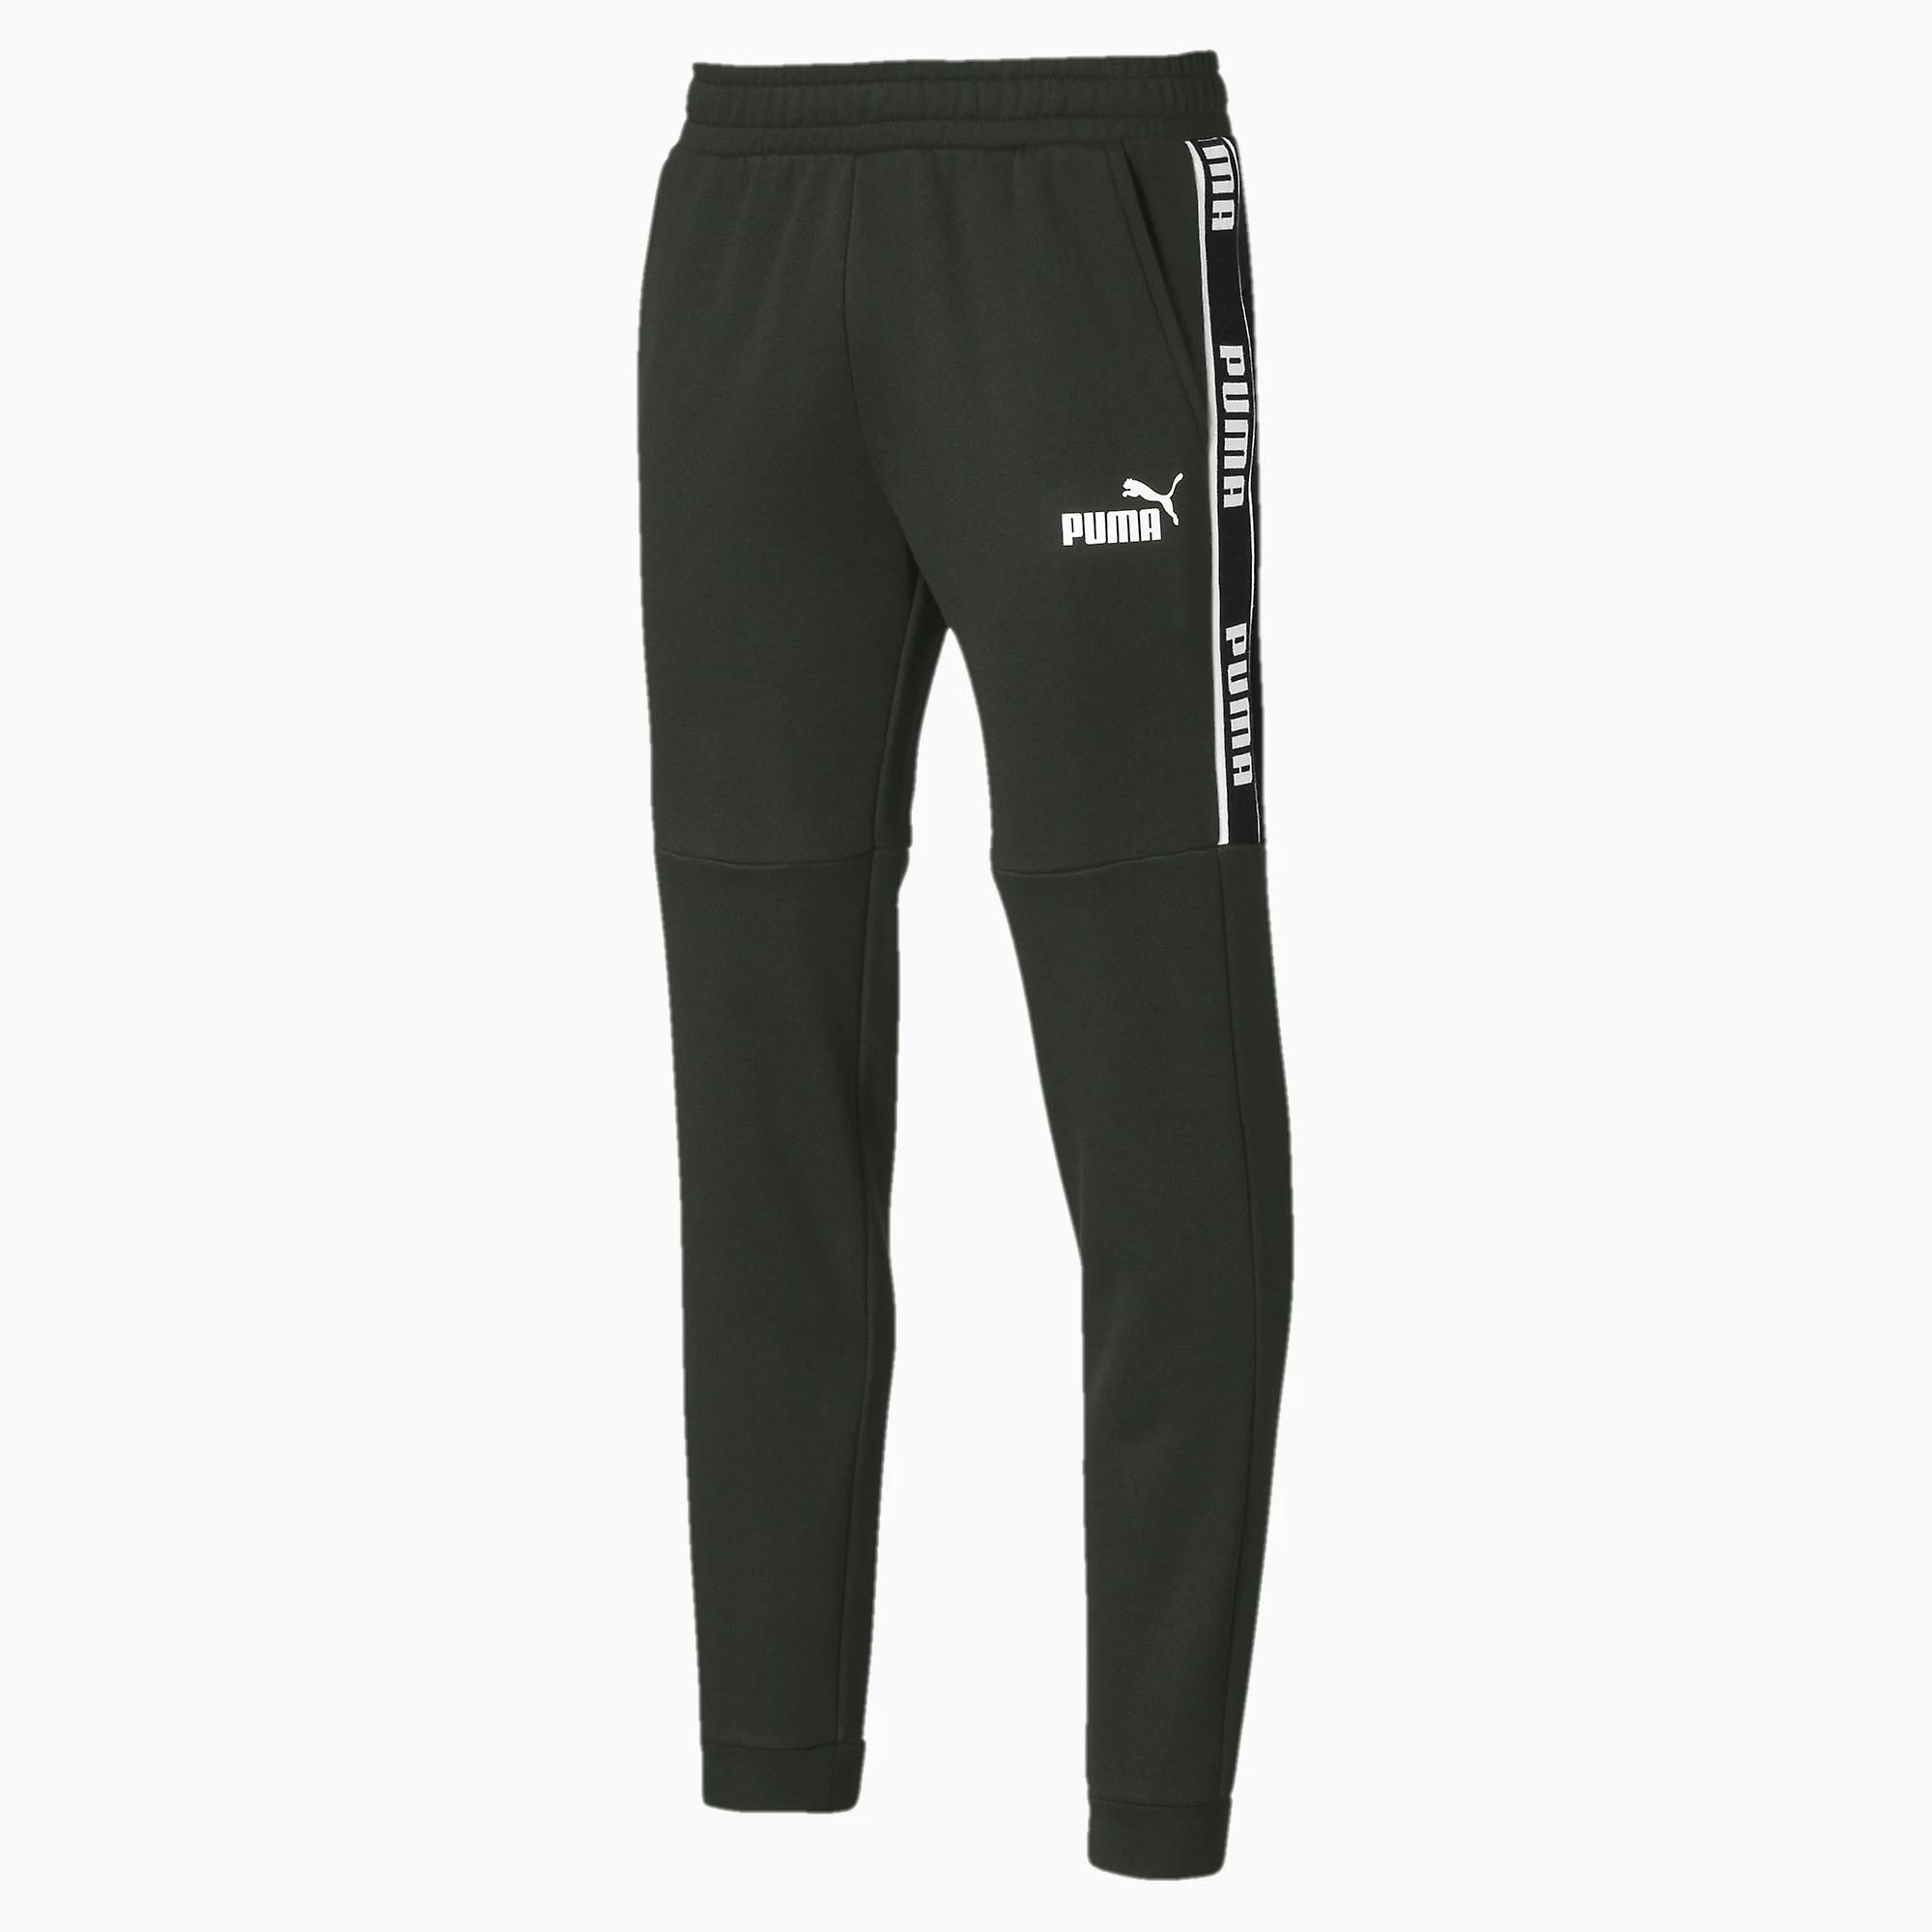 Puma Amplified Fleece Mens Sweat Track Pant Trouser Khaki Green